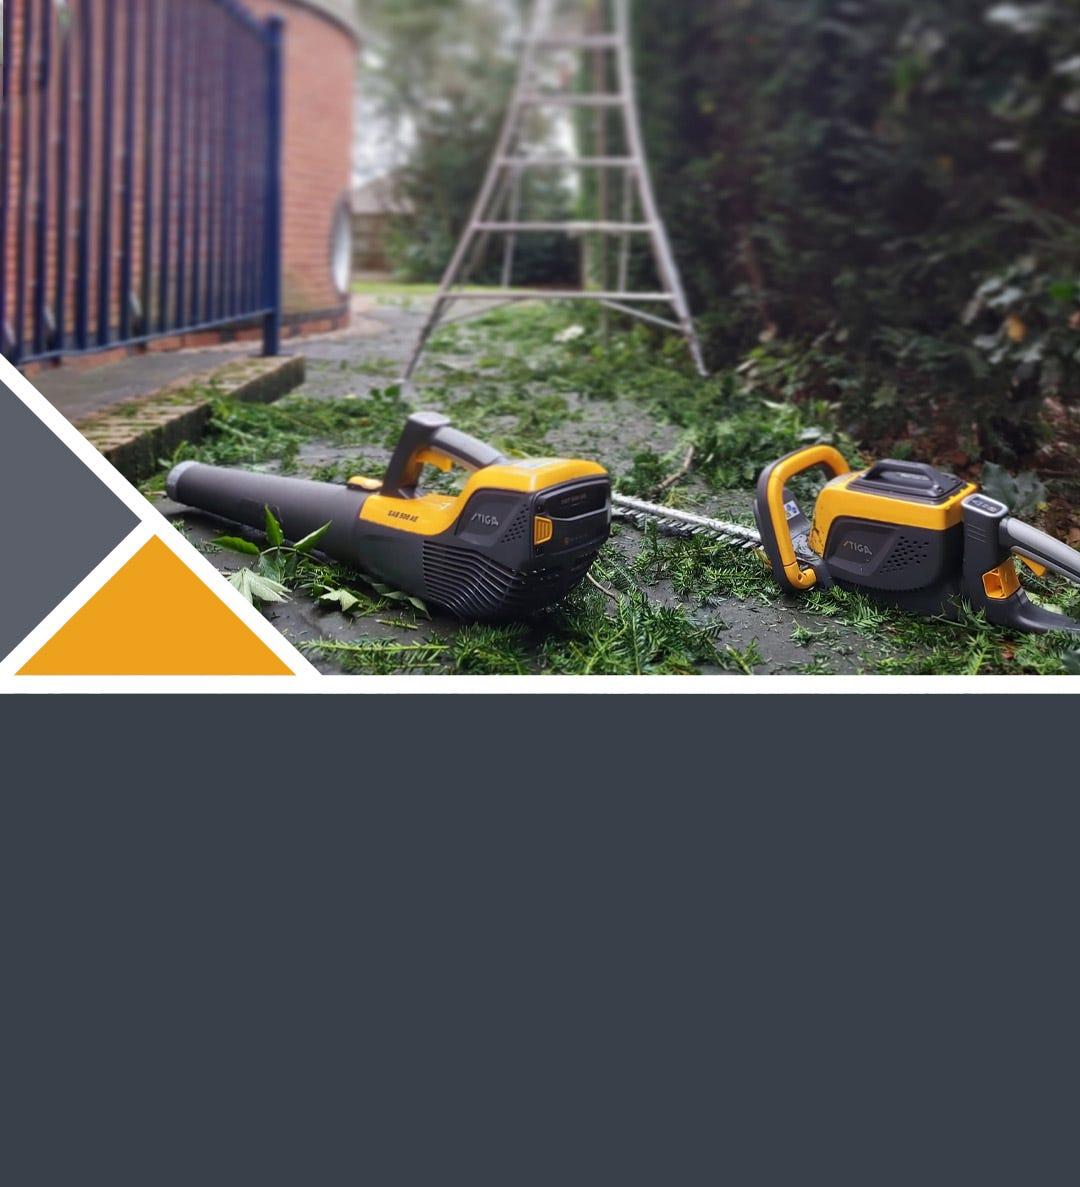 STIGA tools for garden care